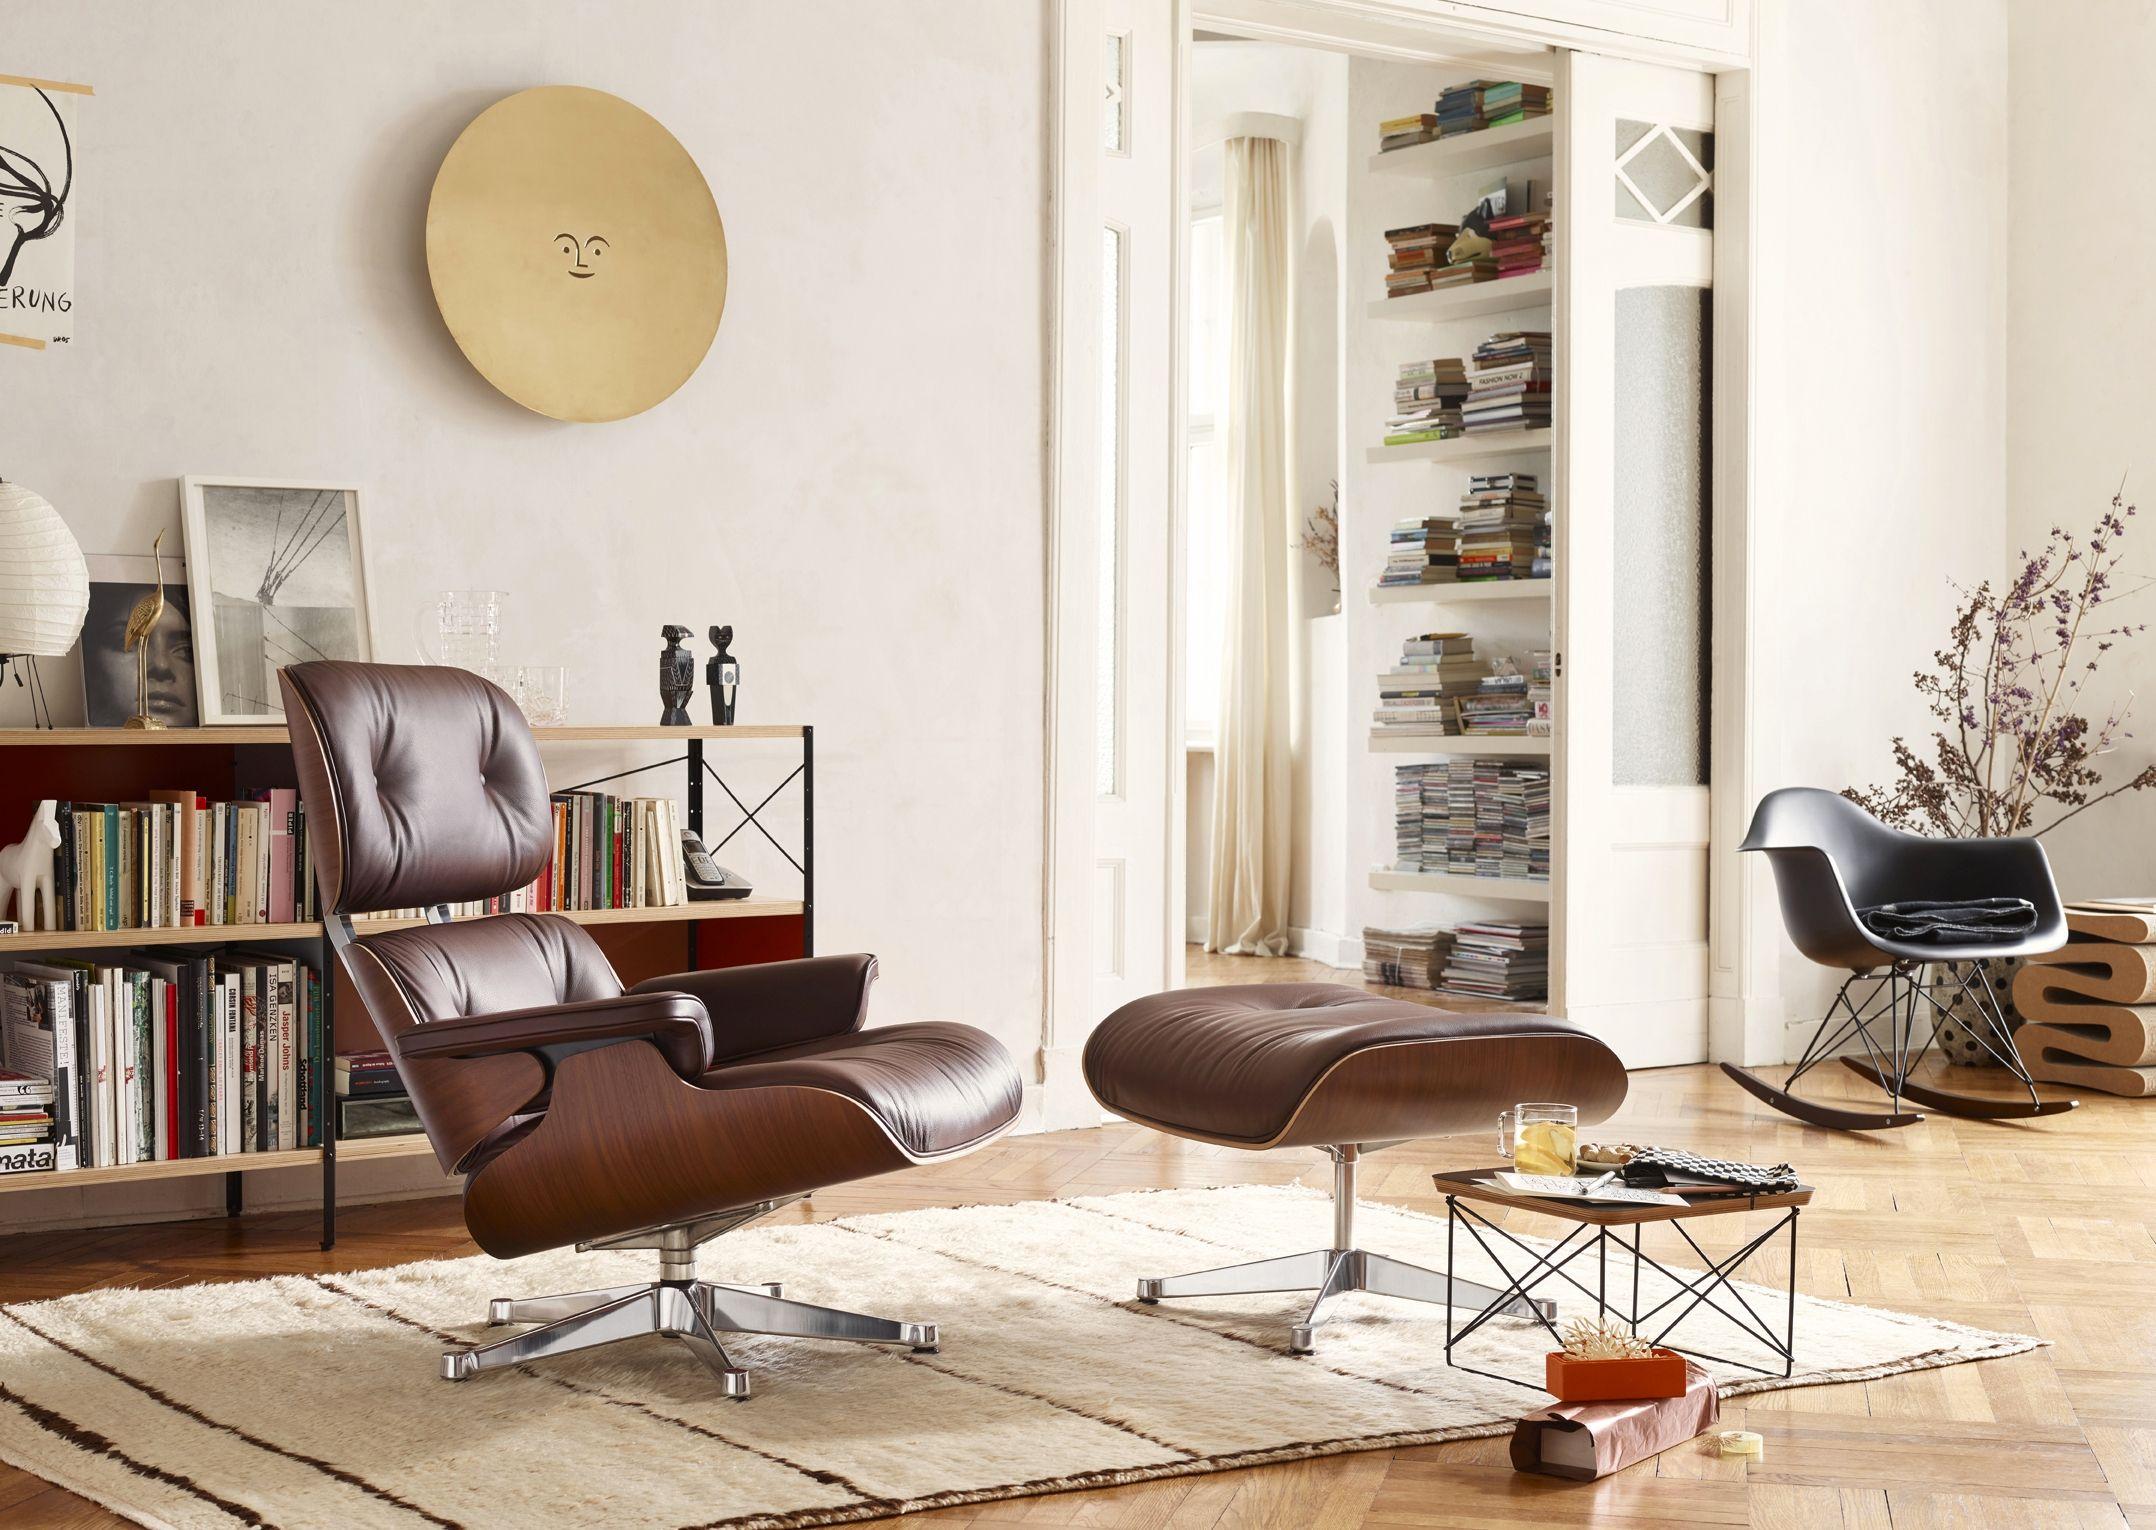 Eames Rar Stoel : Modern vintage amsterdam original eames furniture u armchairs